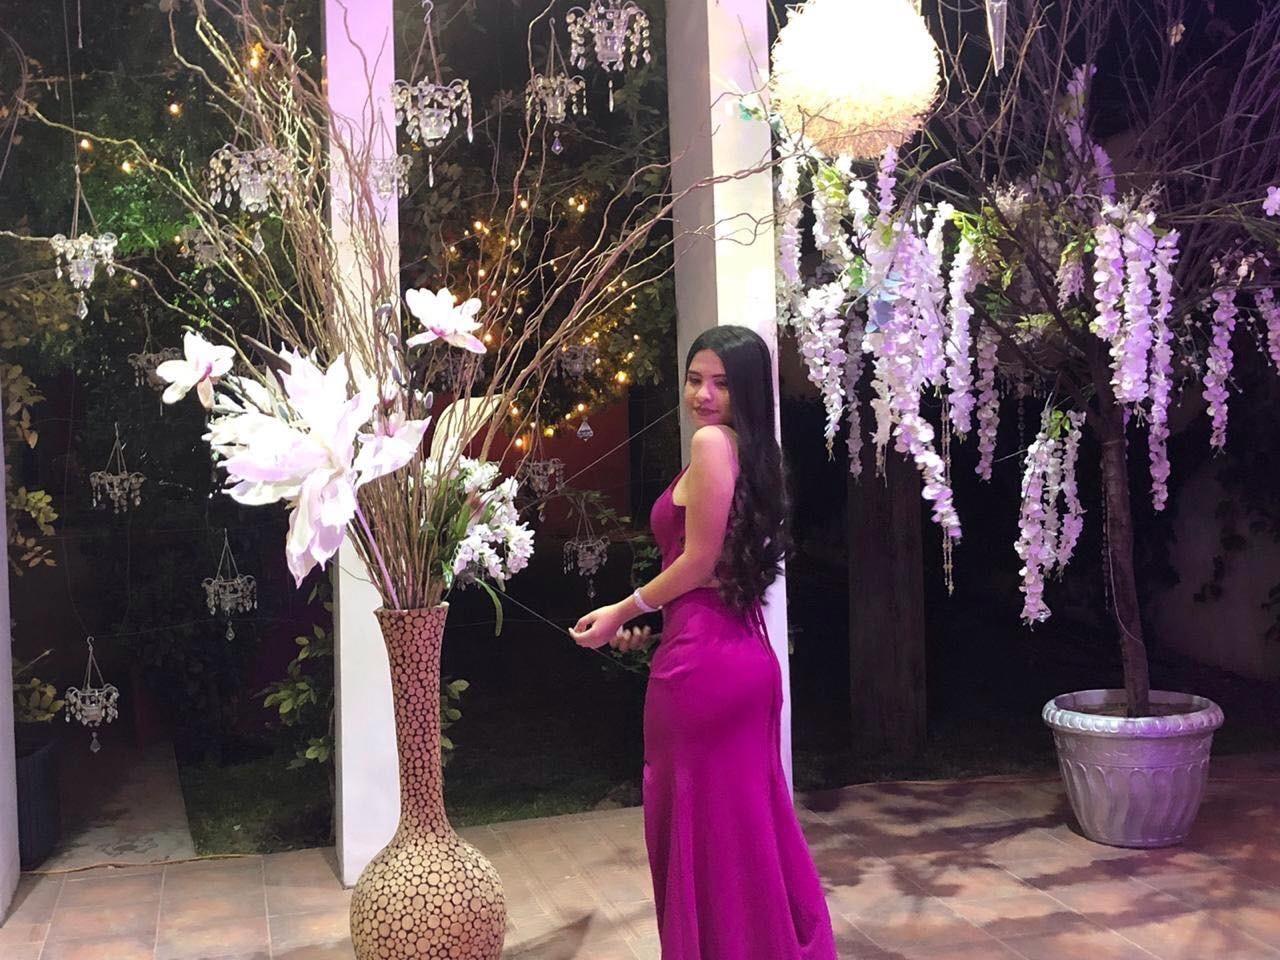 Jovencita busca apoyo para representar a Chihuahua en certamen de belleza en Jalisco